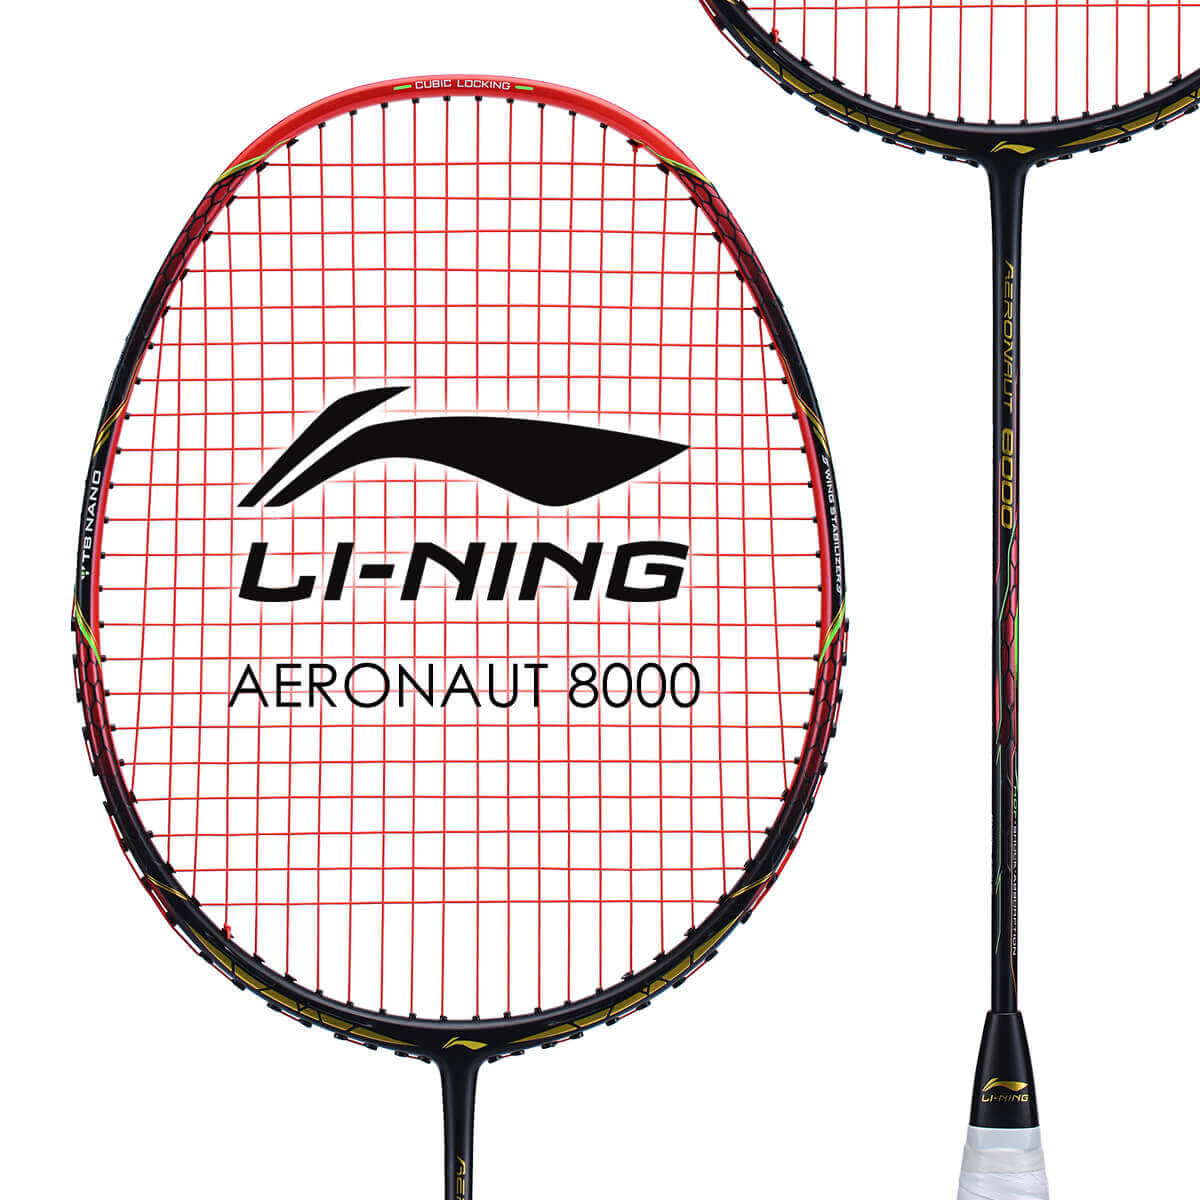 LI-NING AERONAUT 8000(AN8000) 風洞設計 AYPN218-1 バドミントンラケット リーニン【オススメガット&ガット張り工賃無料/ 日本バドミントン協会審査合格品】